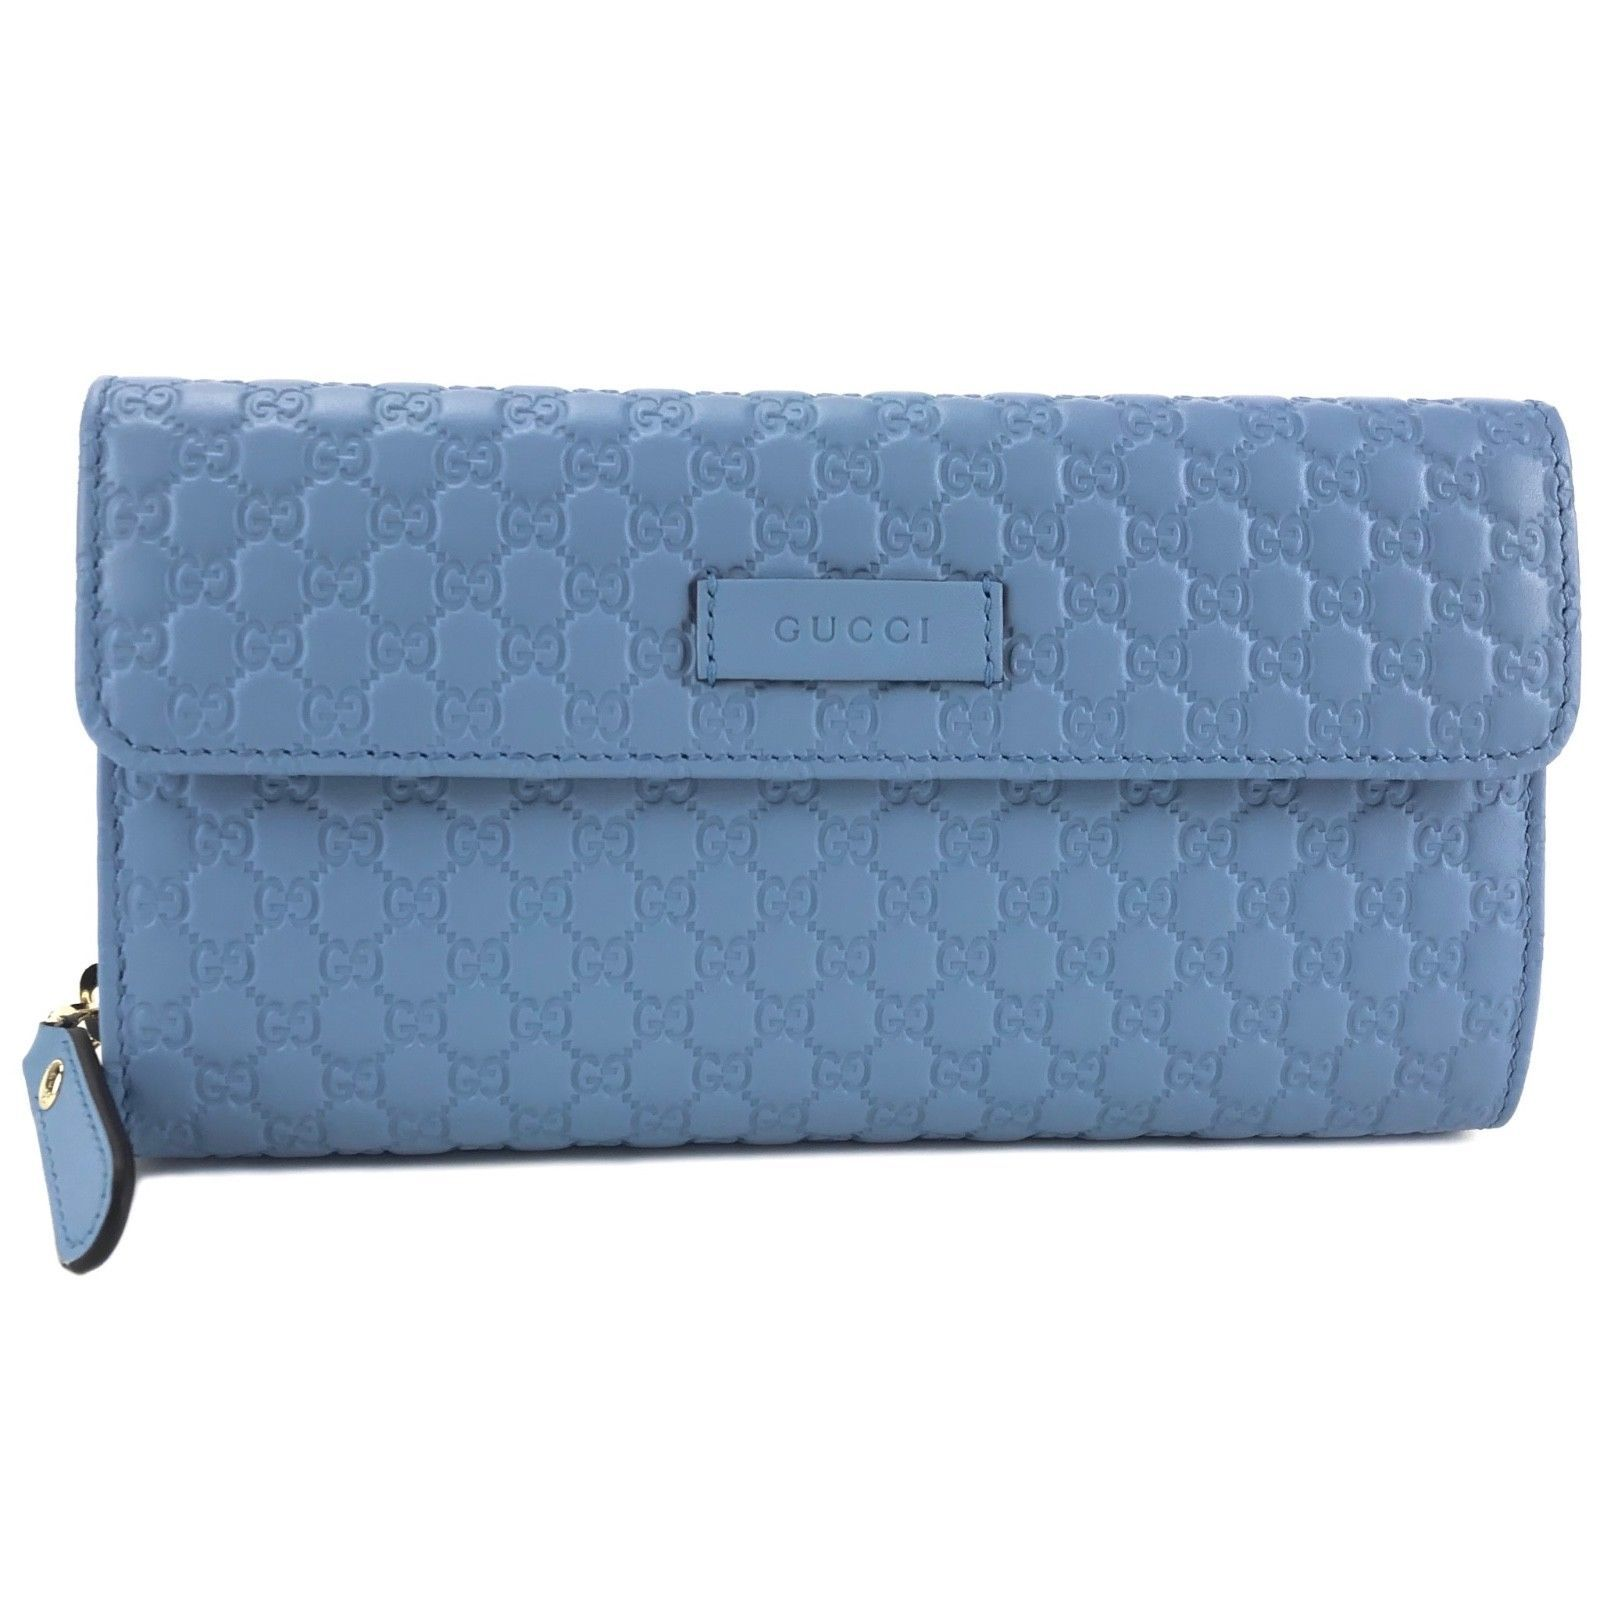 a207a7550fa5 GUCCI 449364 Microguccissima Blue Leather and 50 similar items